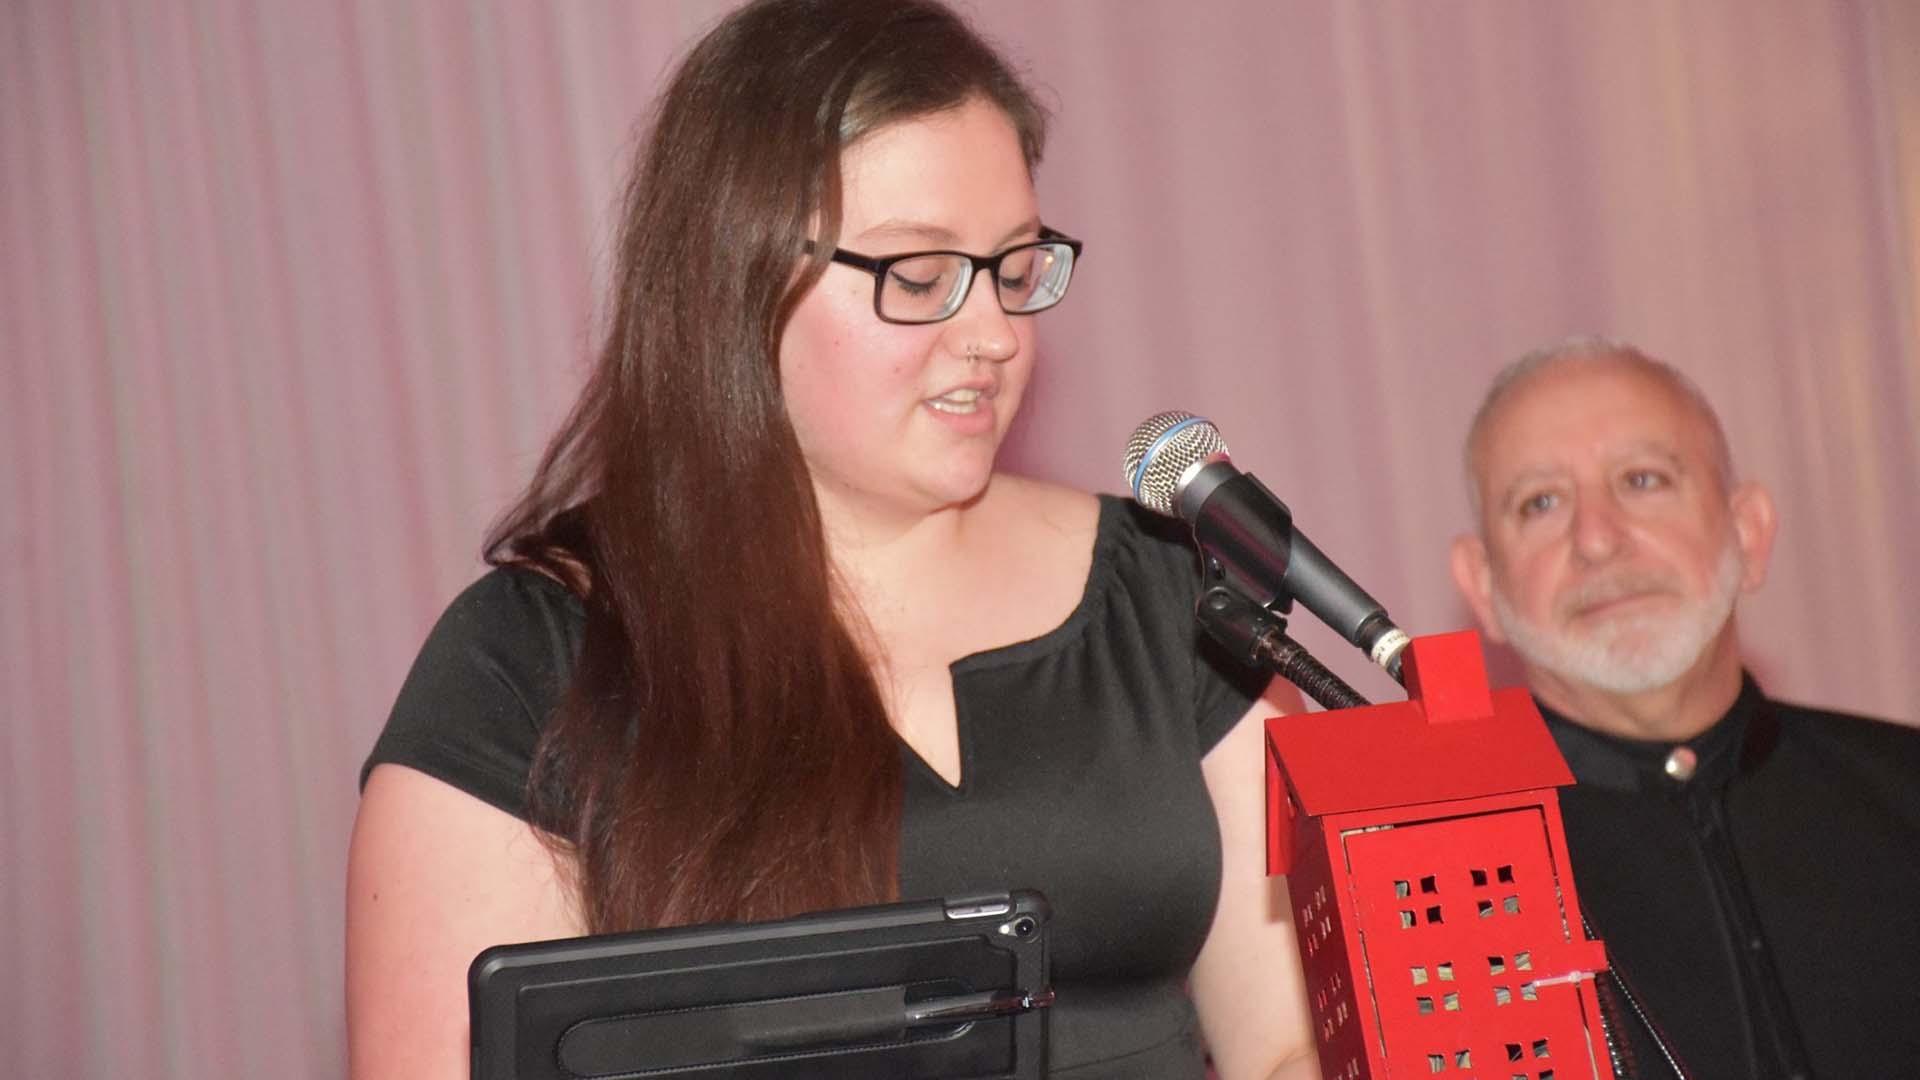 photo of Martyna Sroka from Christina Renna Foundation